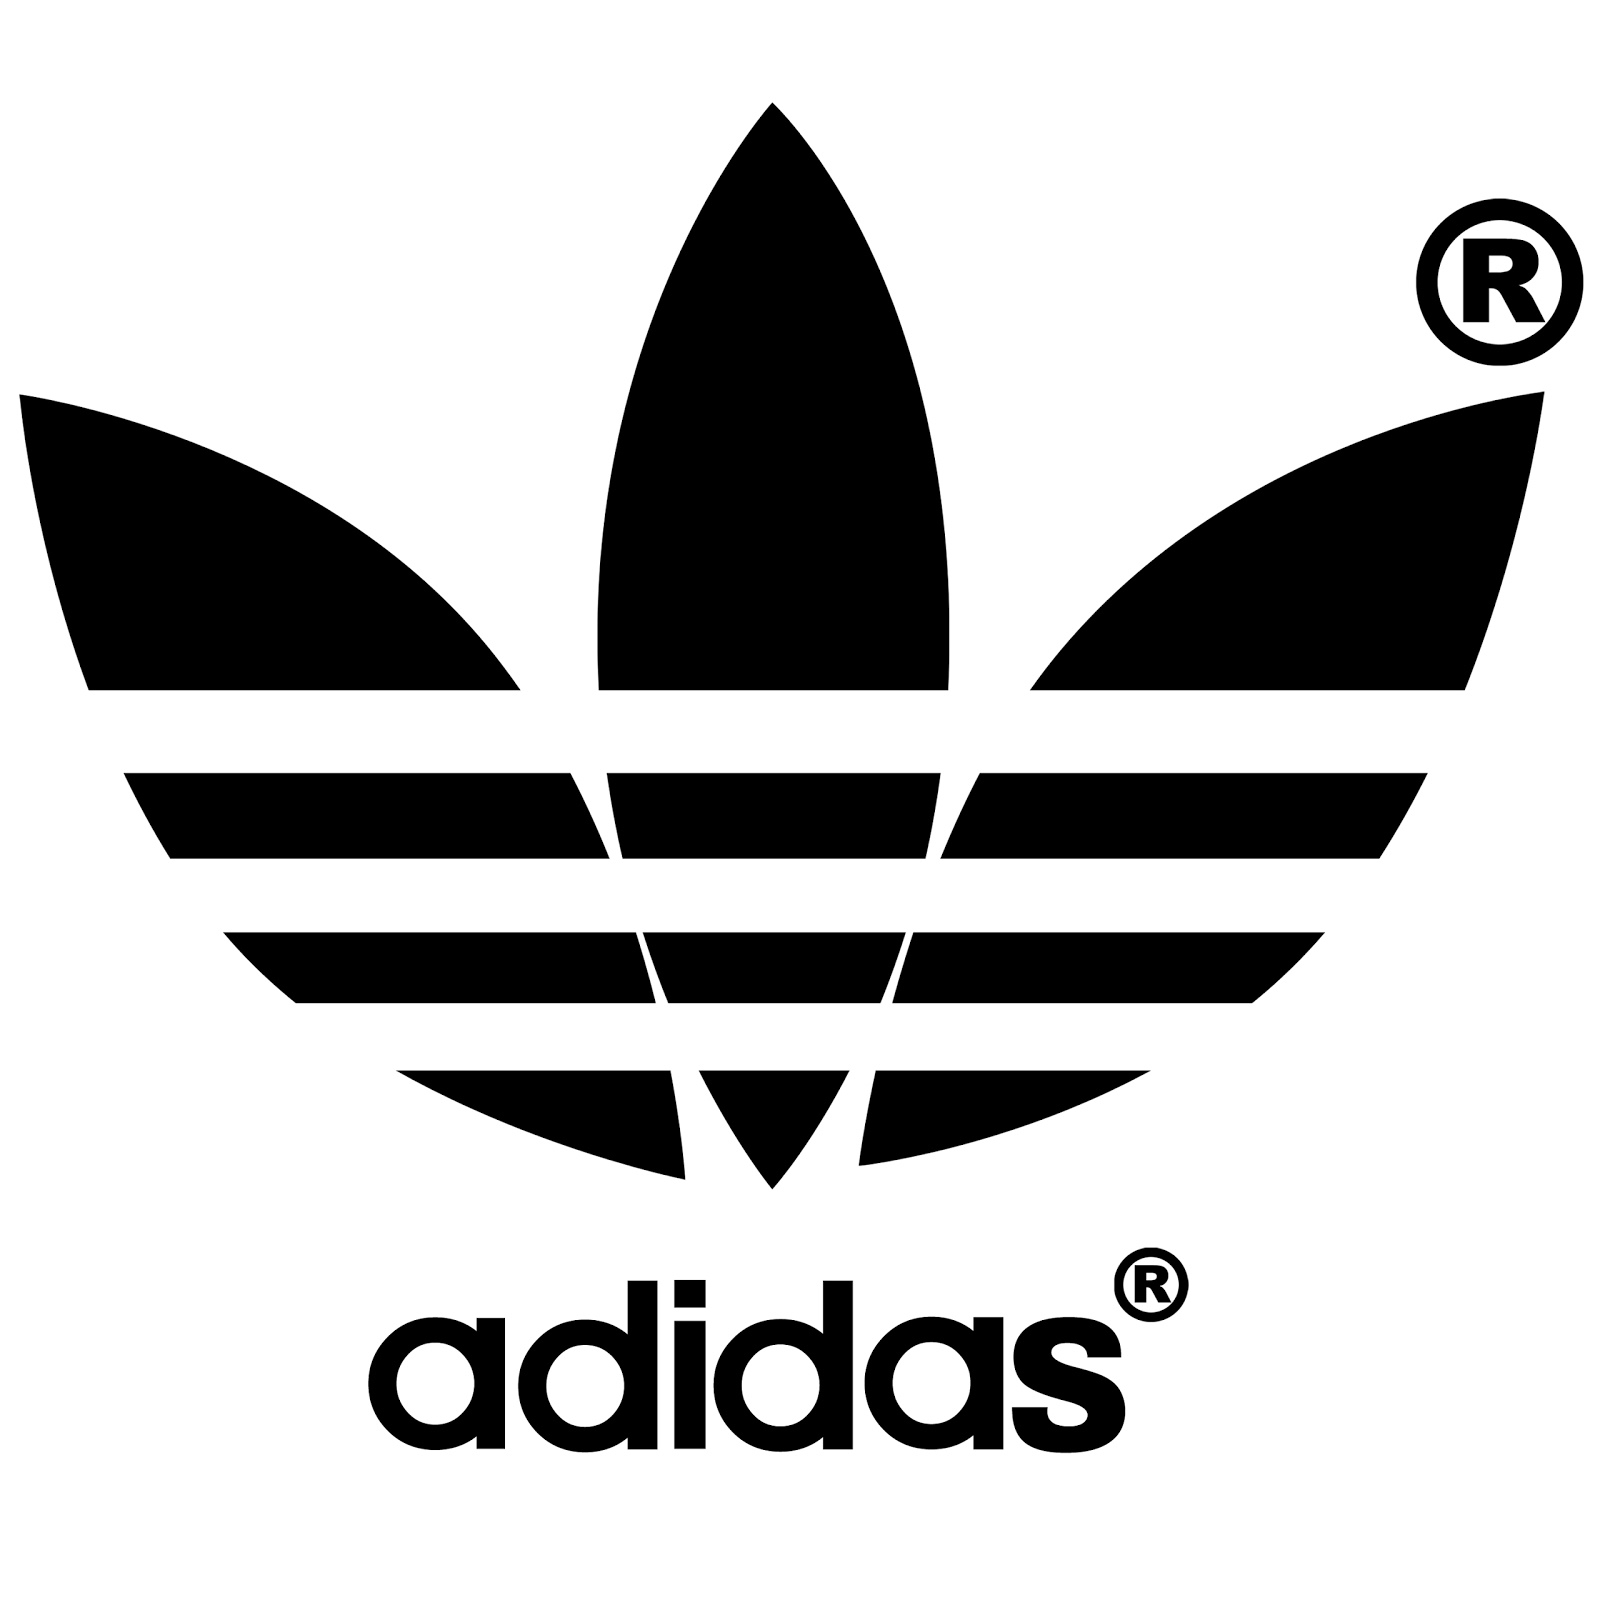 NADIA Art Logo: Adidas Logo